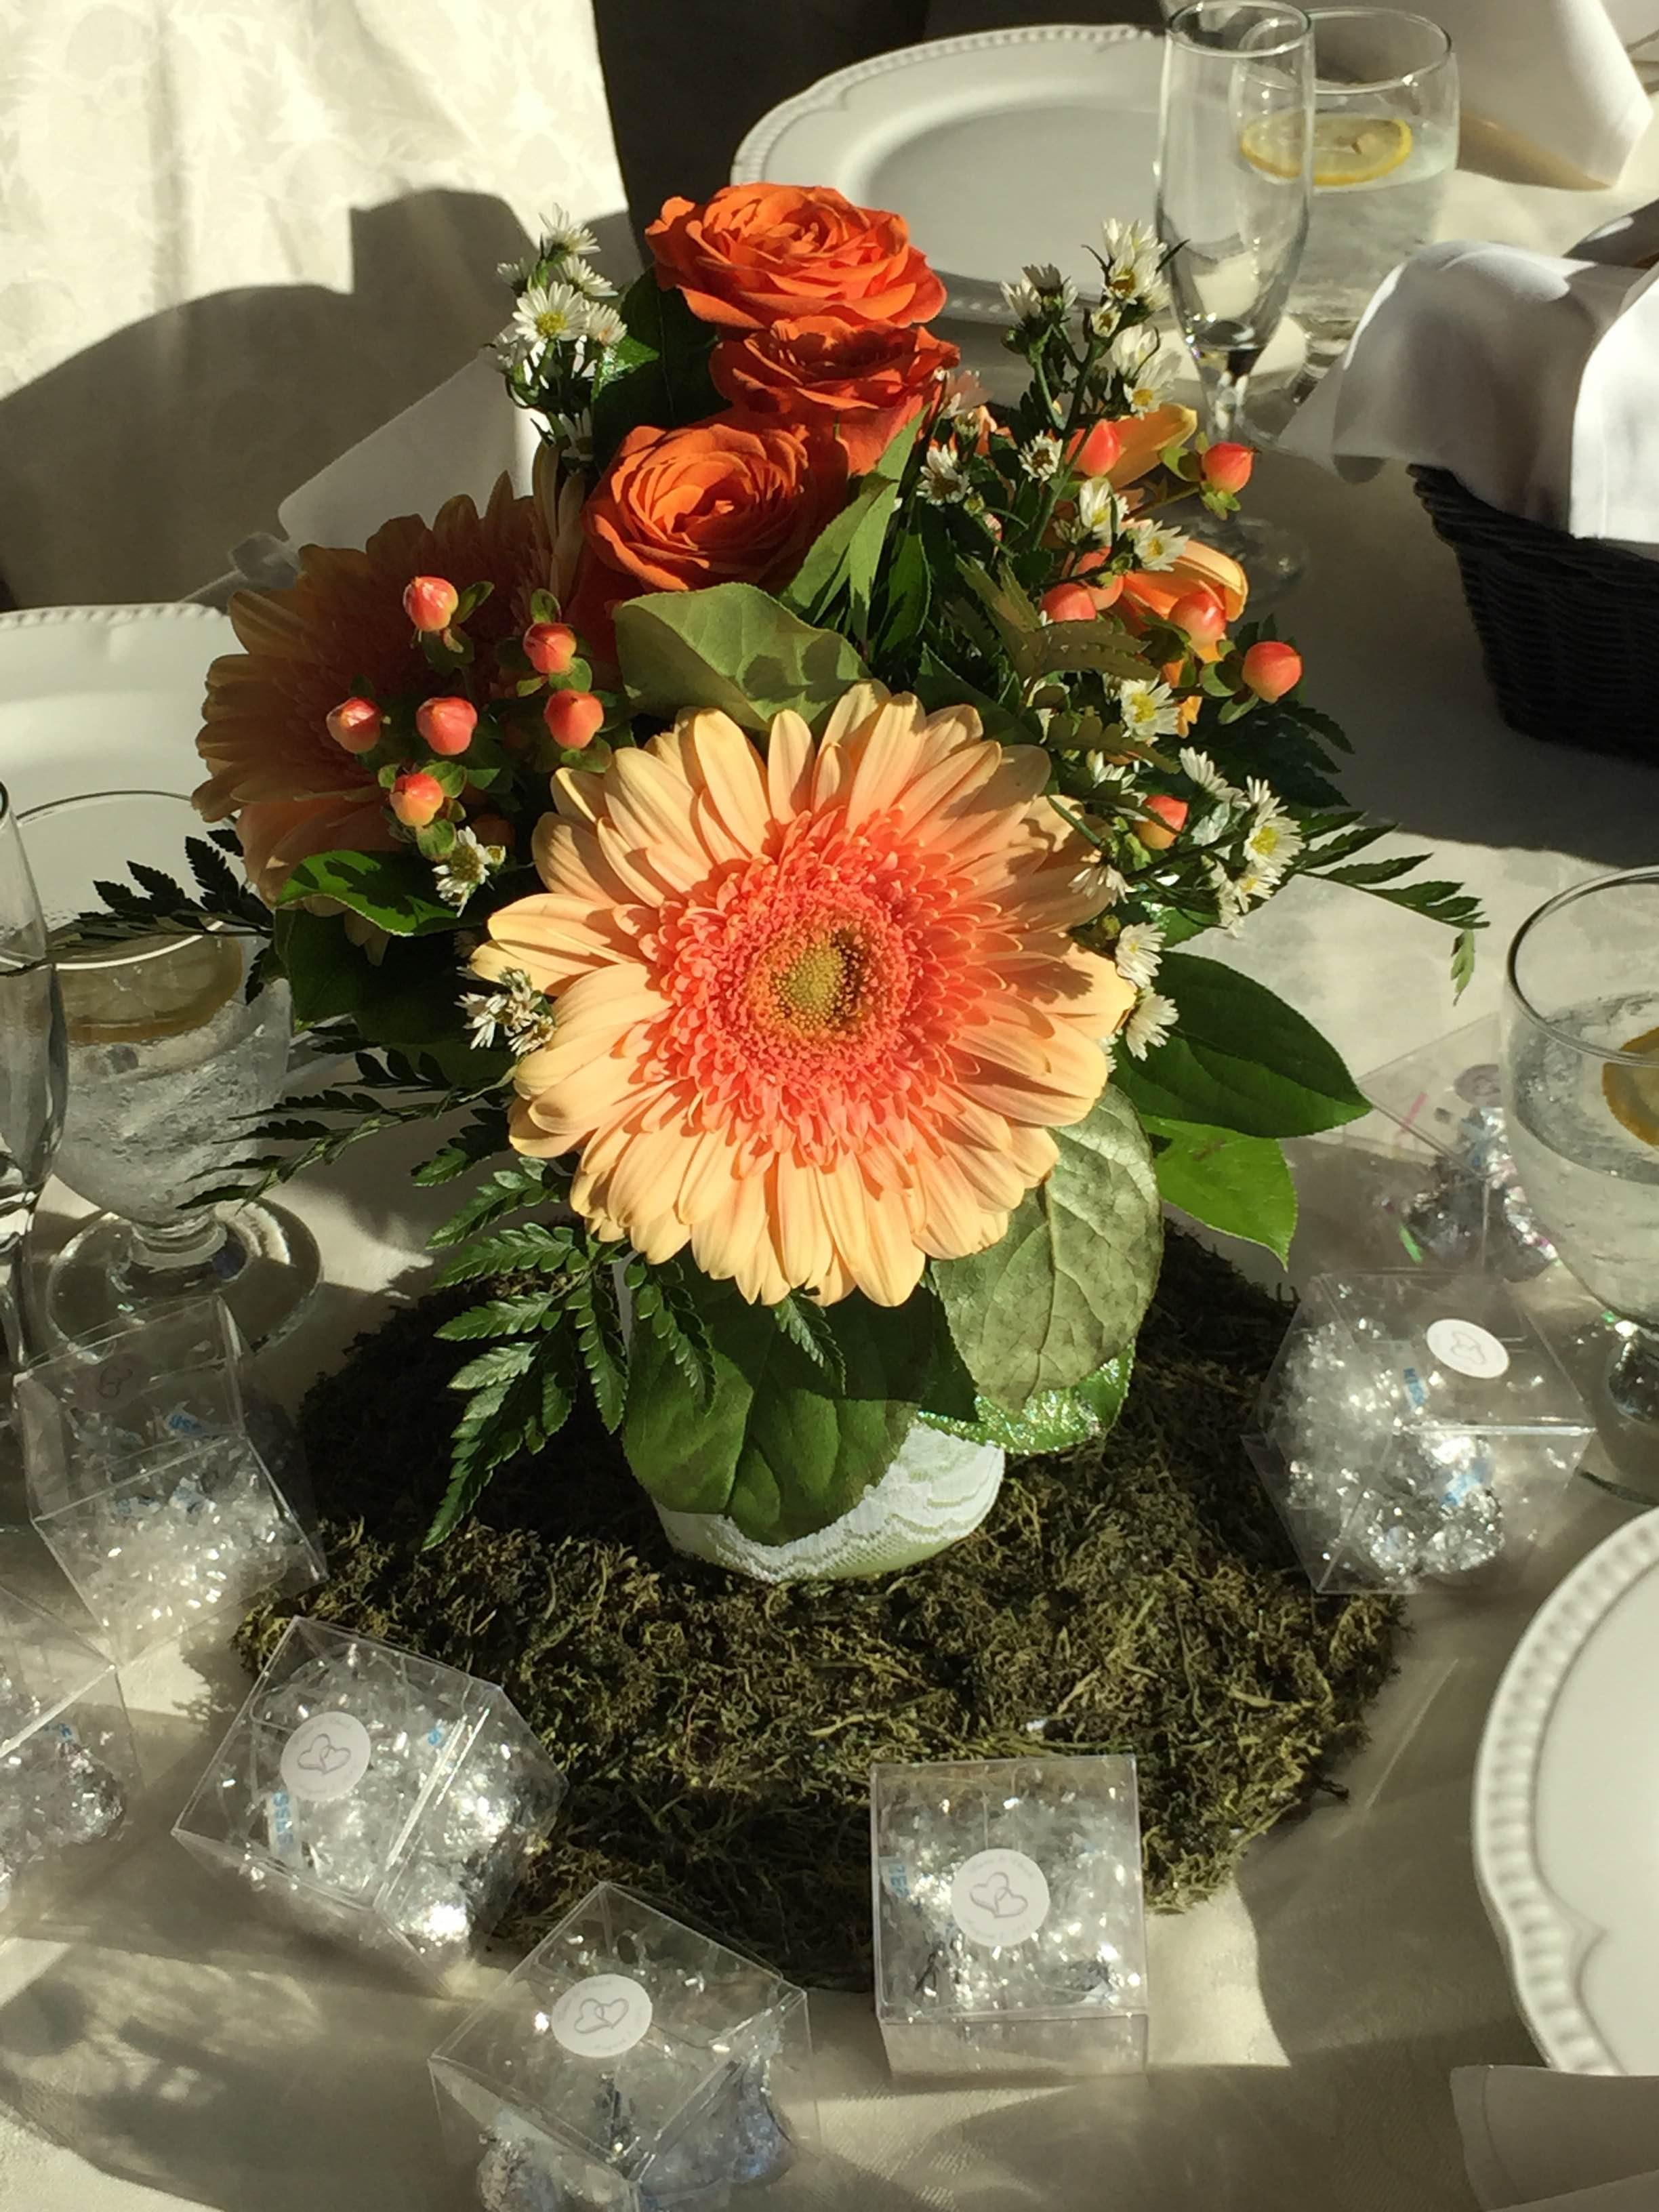 Evelisa Floral & Design's Coral & Mint mason jar Centerpiece.